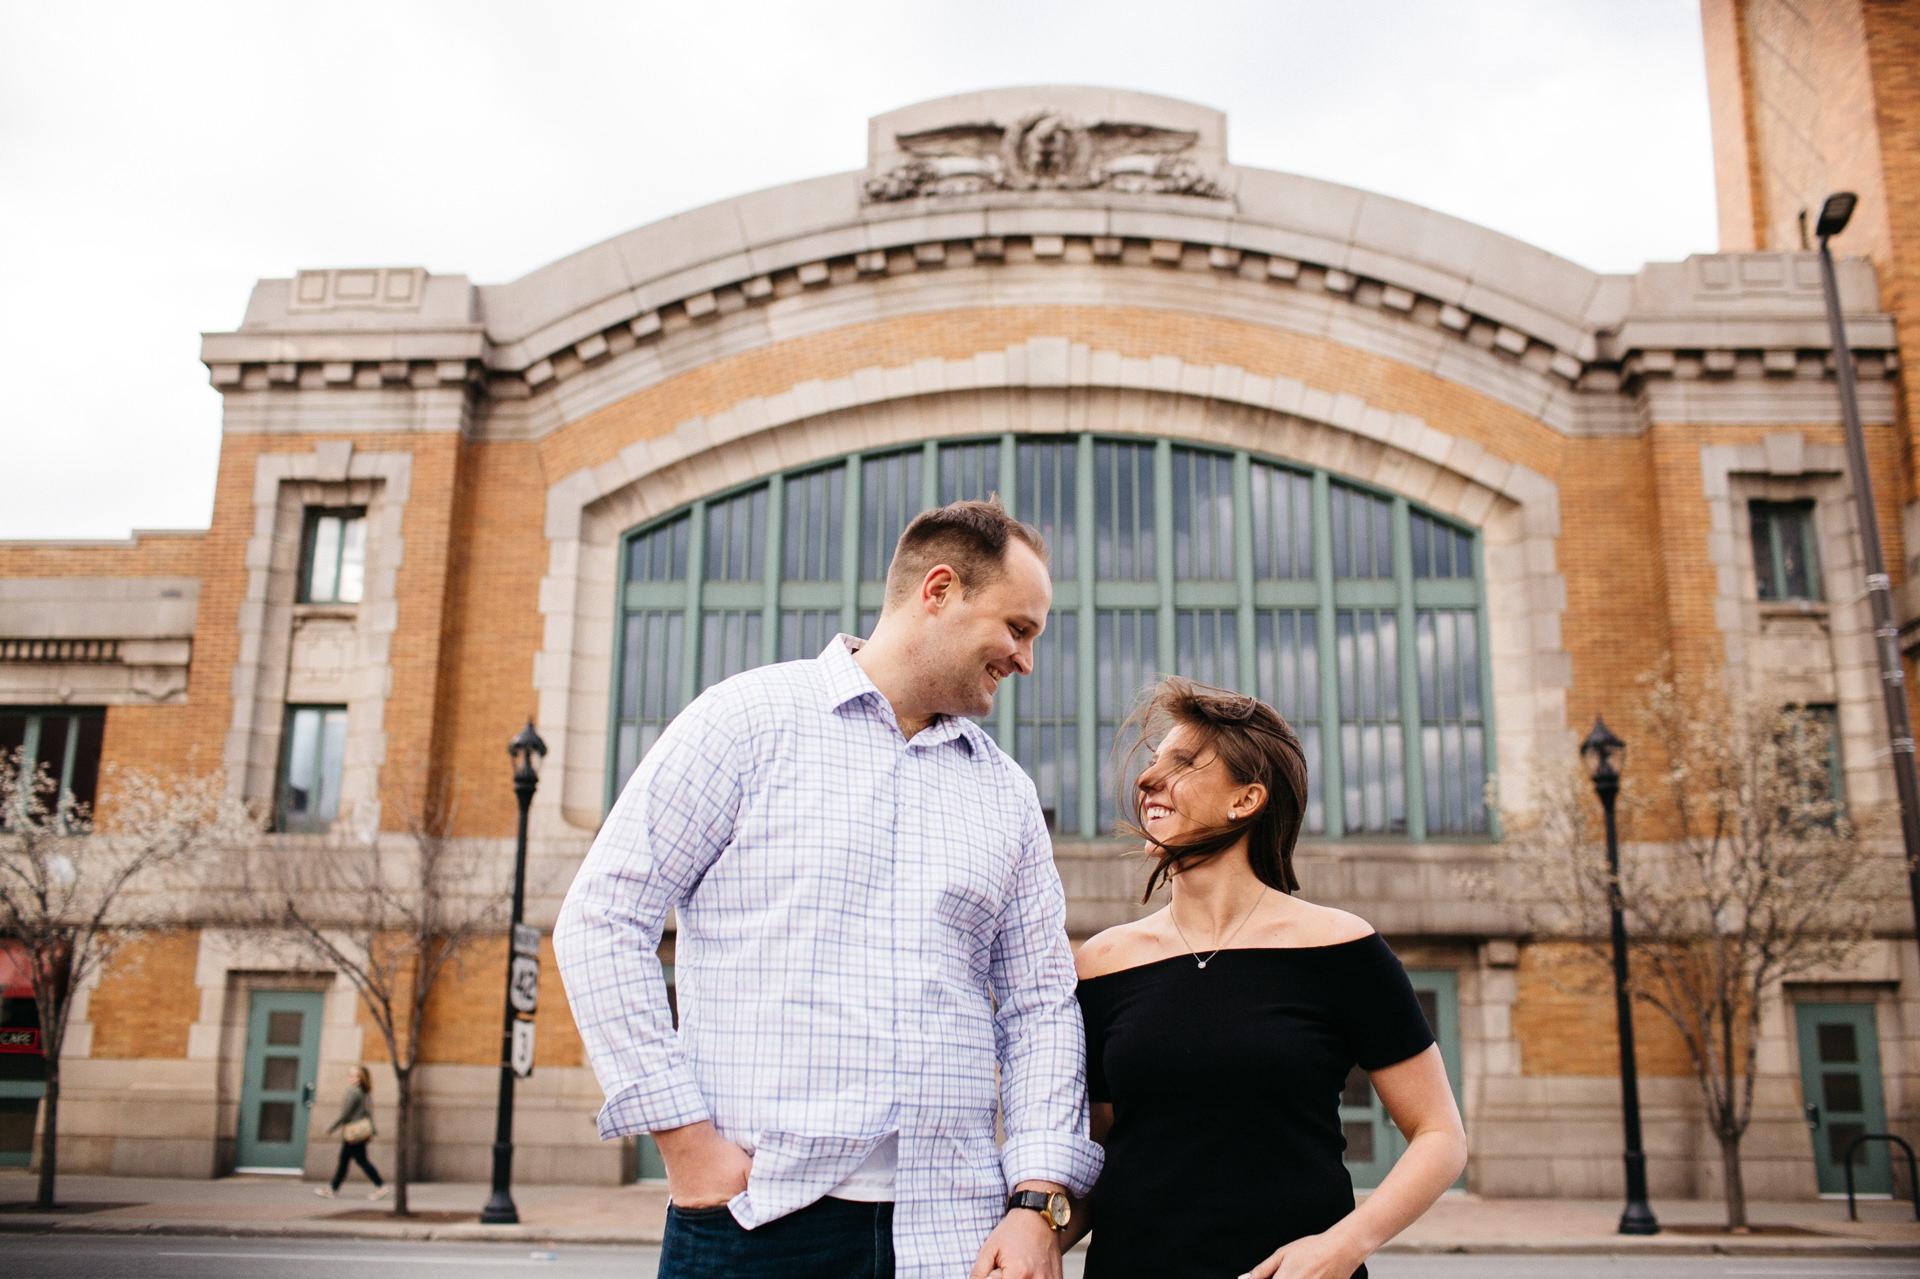 Rocky RIver Ohio Engagement and Wedding Photographer 4.jpg